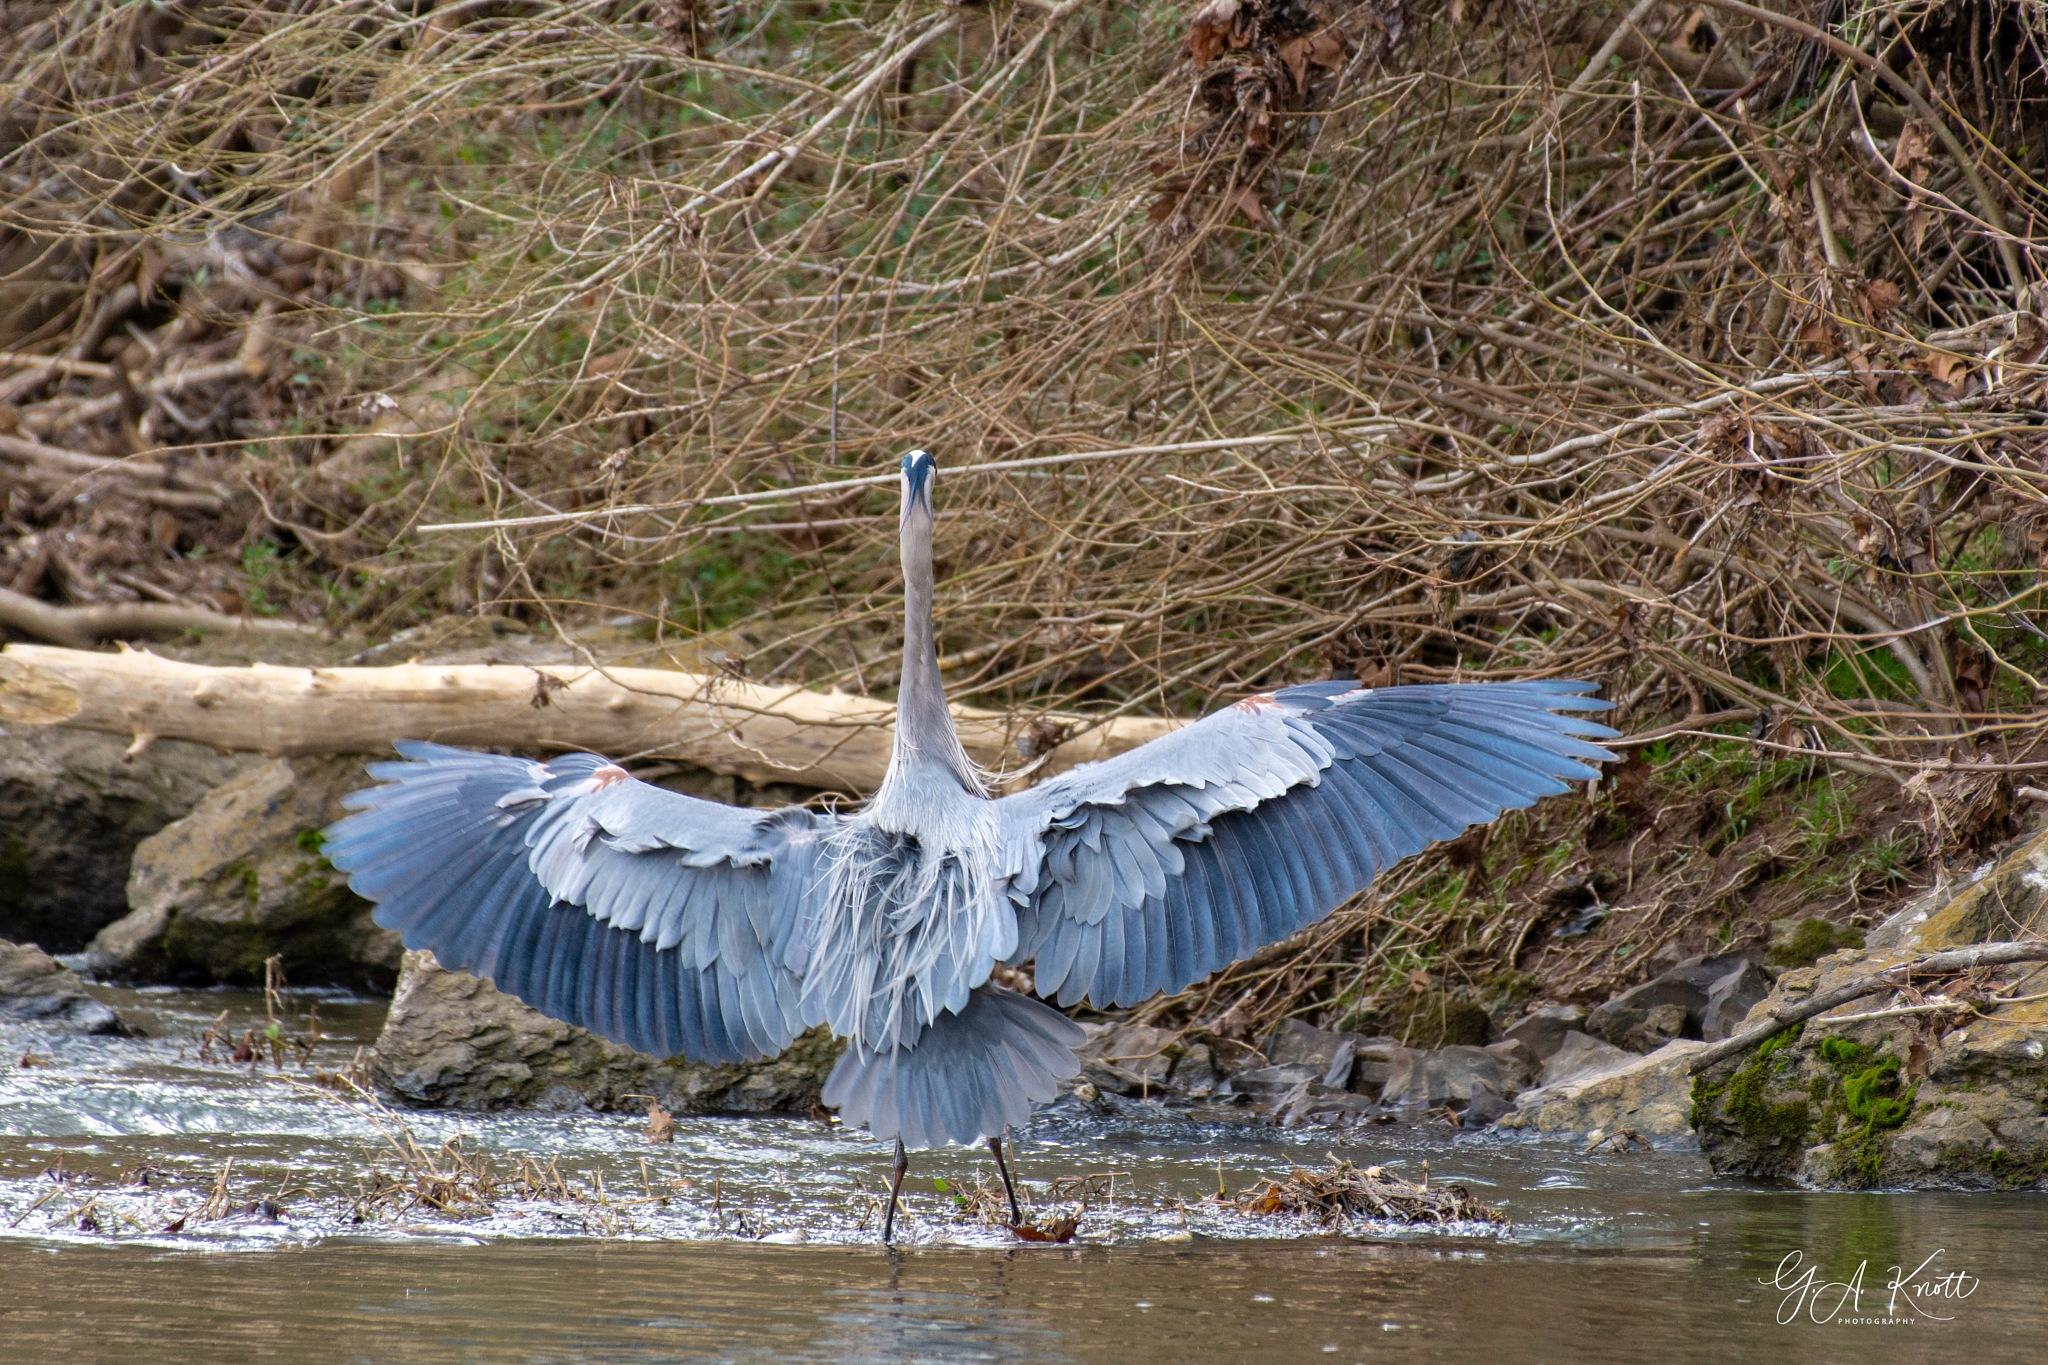 Landing by Greg Knott